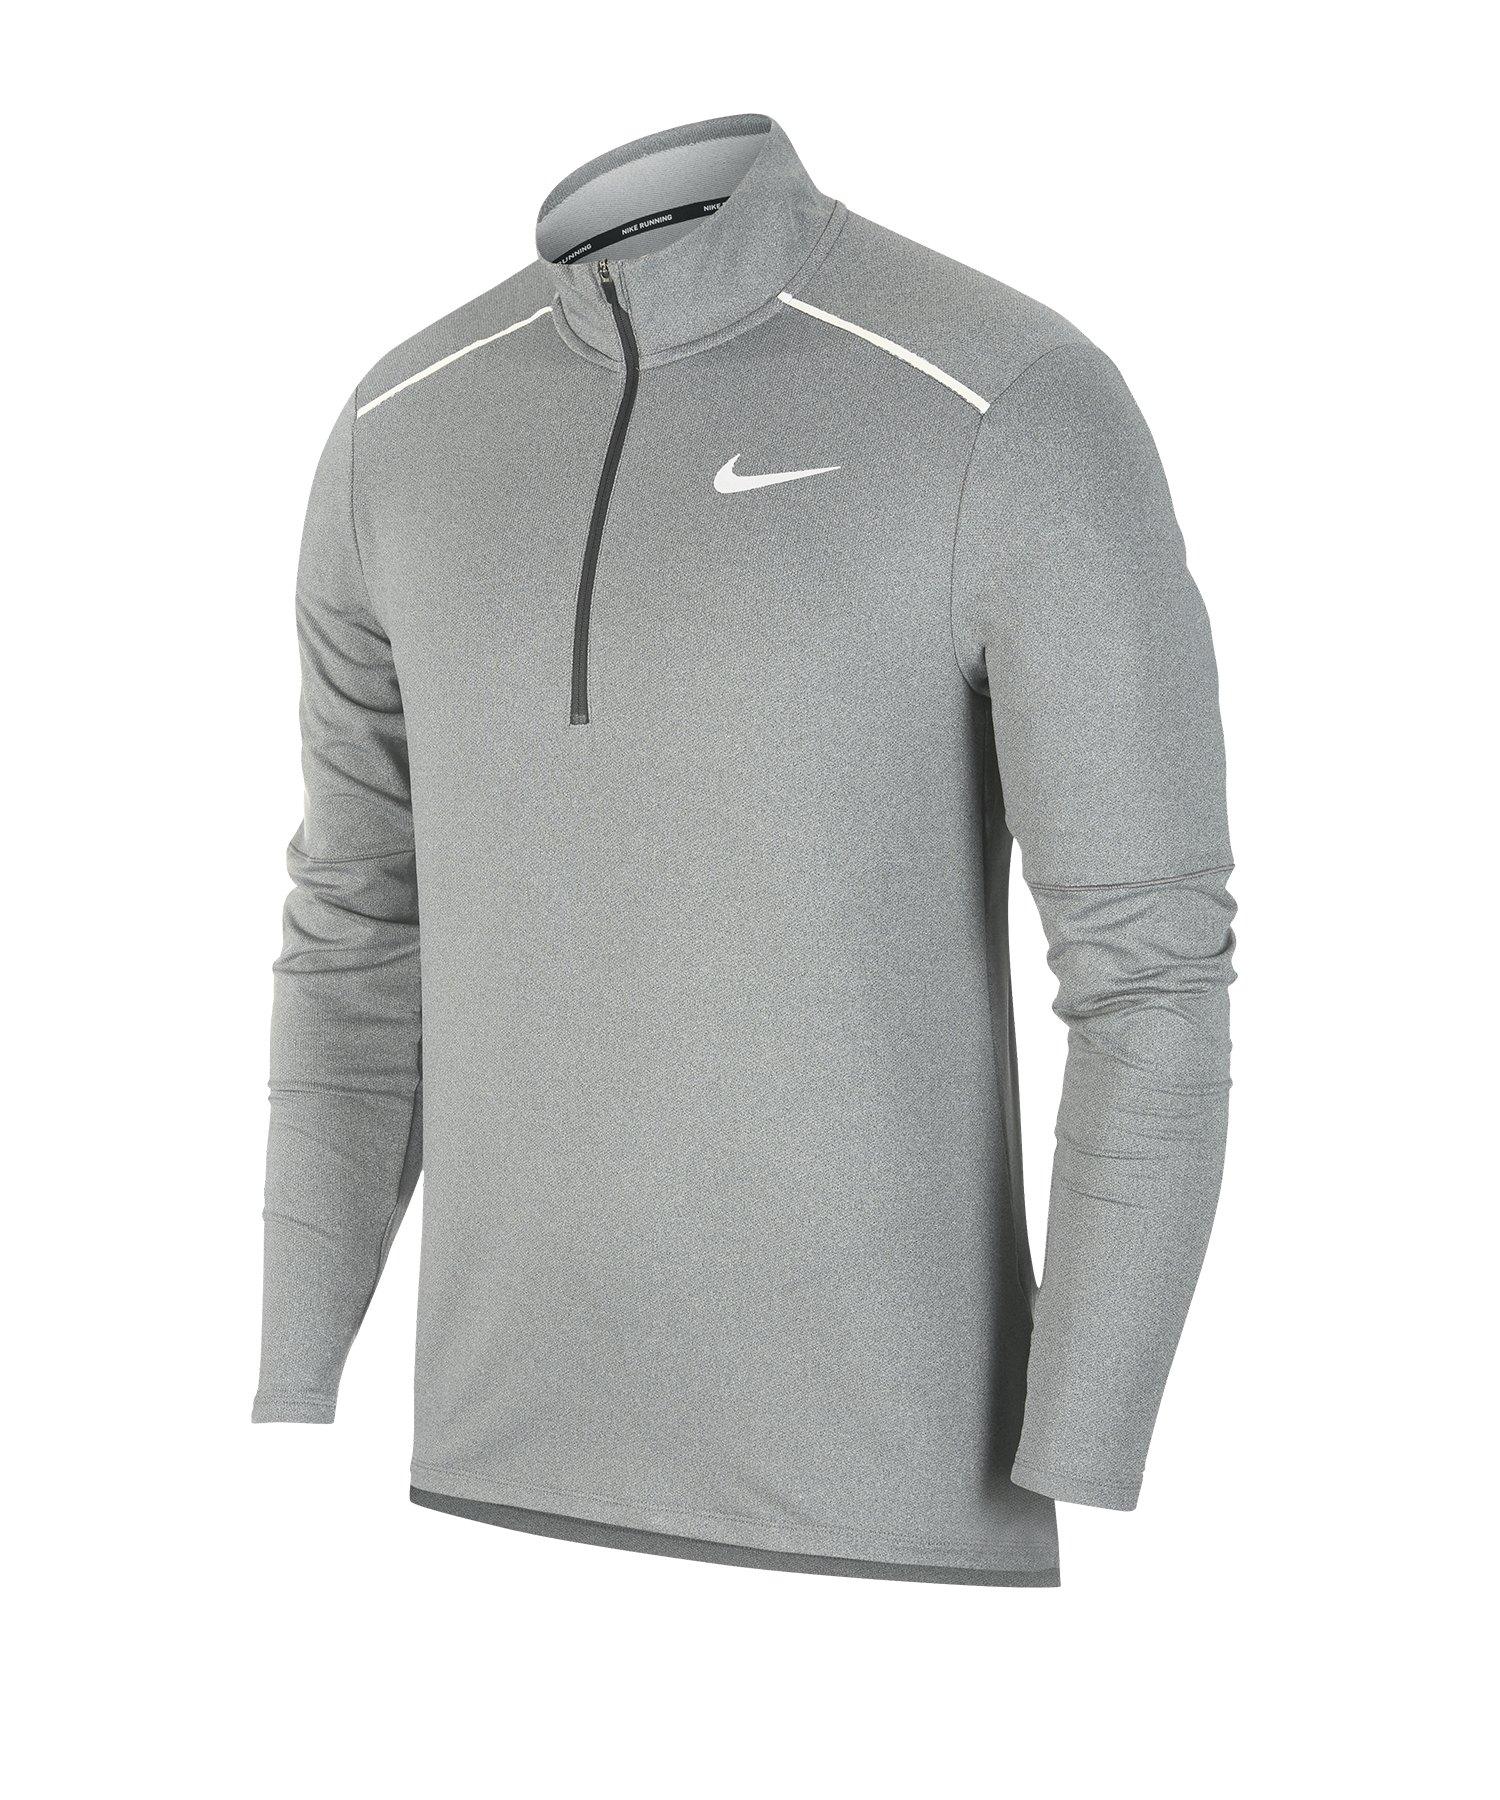 Nike Element 3.0 1/2-Zip Running Top langarm F068 - grau